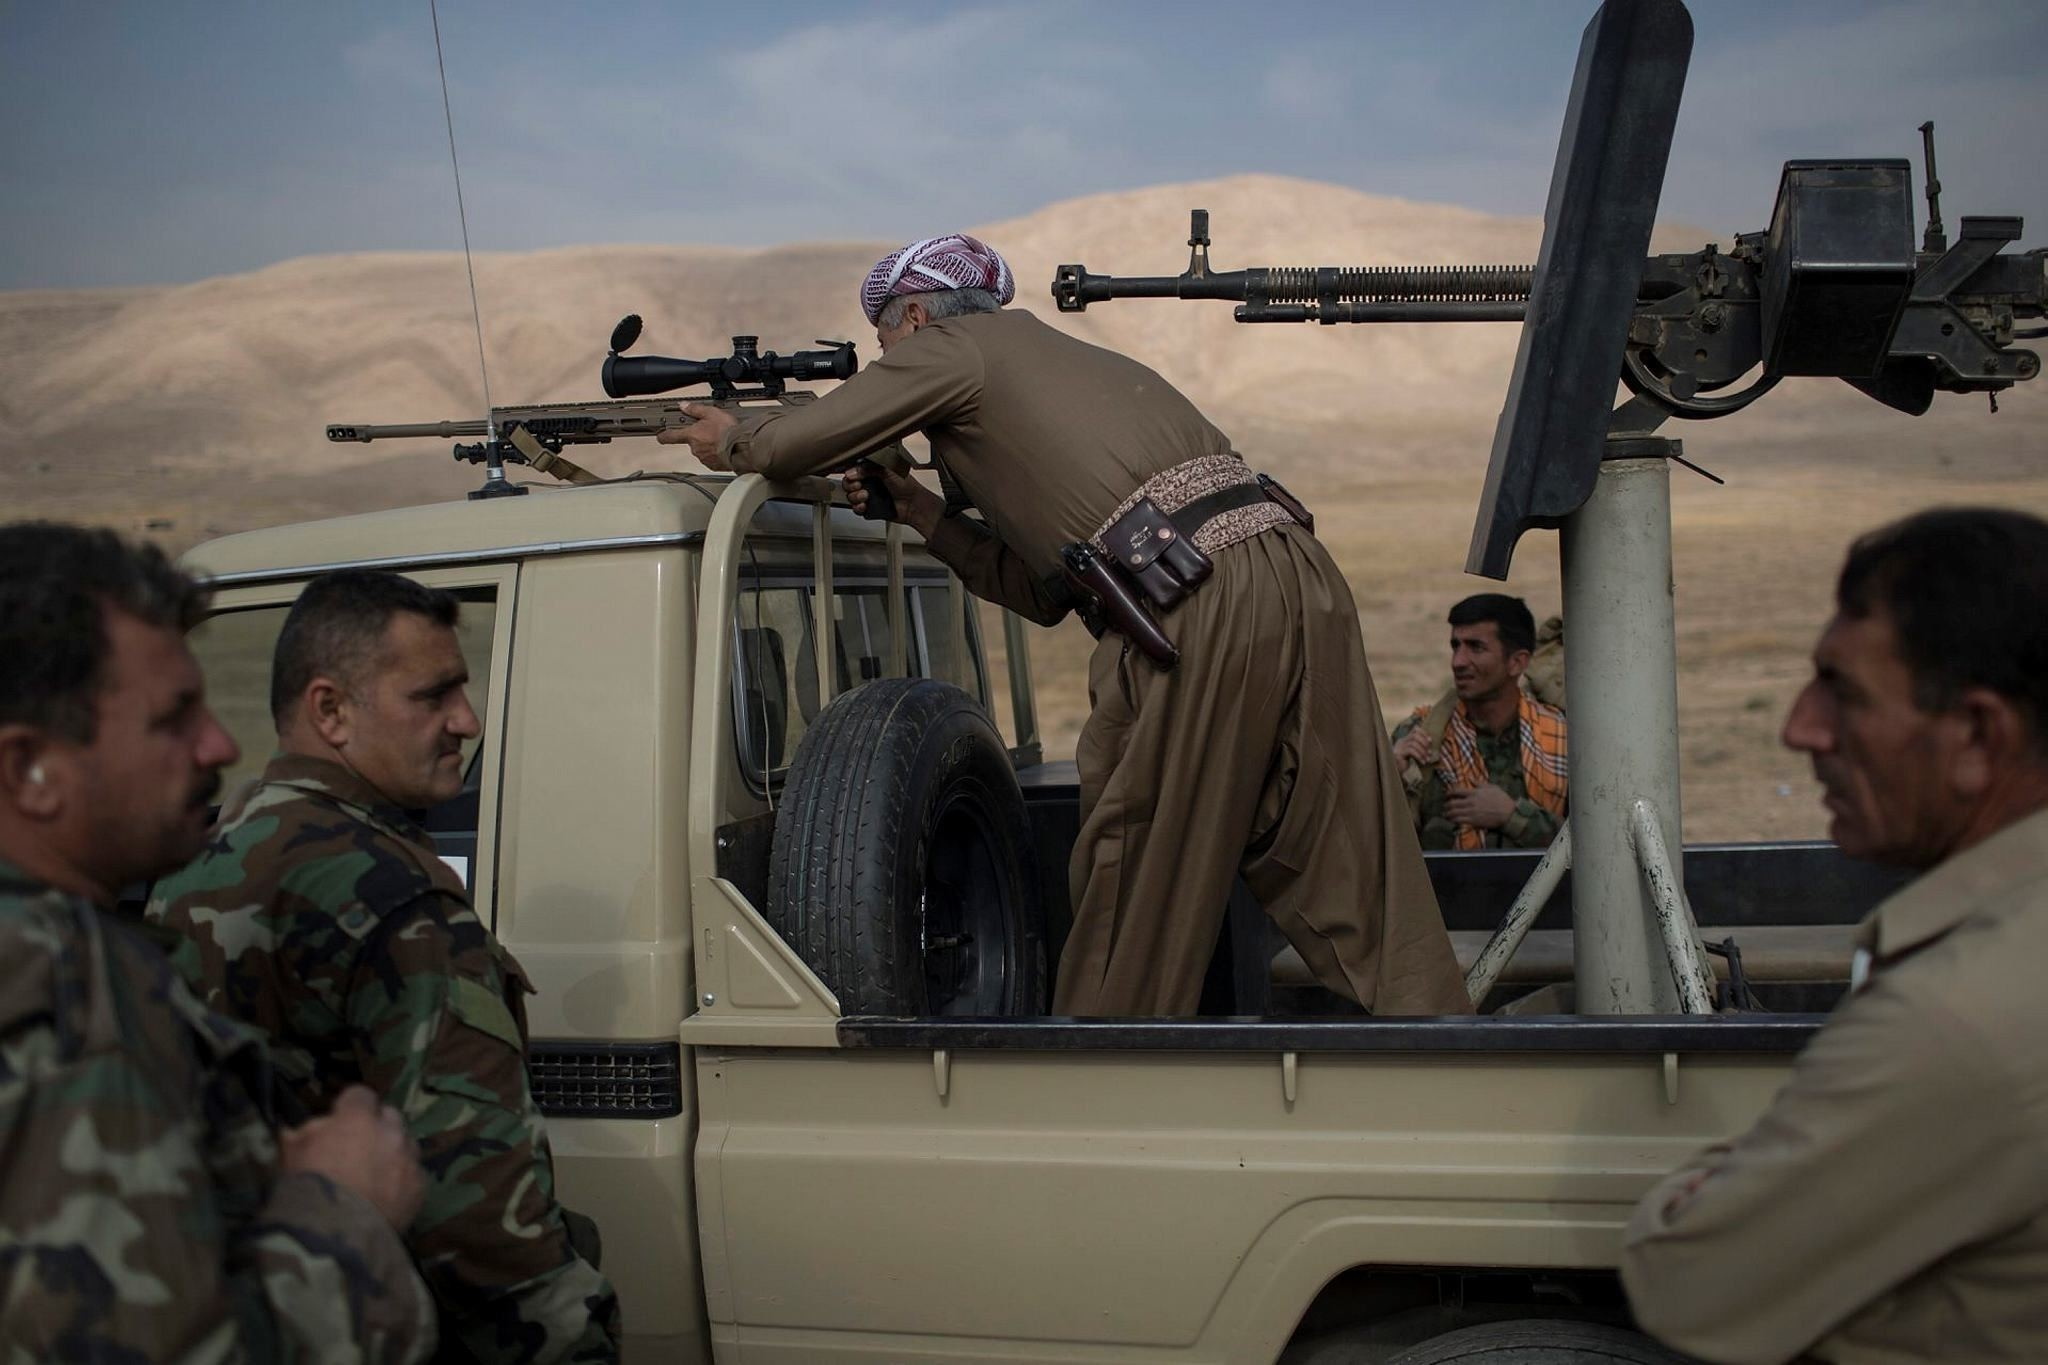 Kurdish Peshmerga fighter looks at Daesh militant positions during heavy fighting in Bashiqa, east of Mosul, Iraq. (AP Photo)